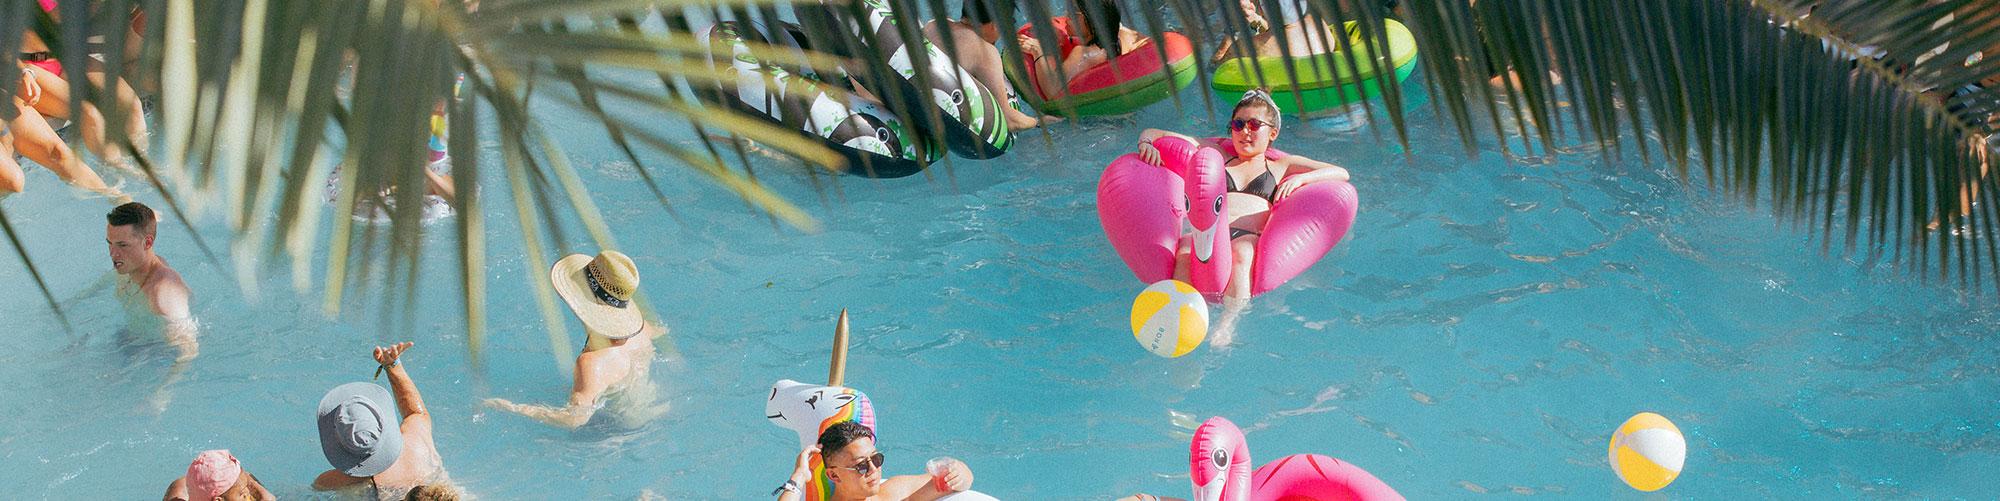 Splash House festival goers in pool